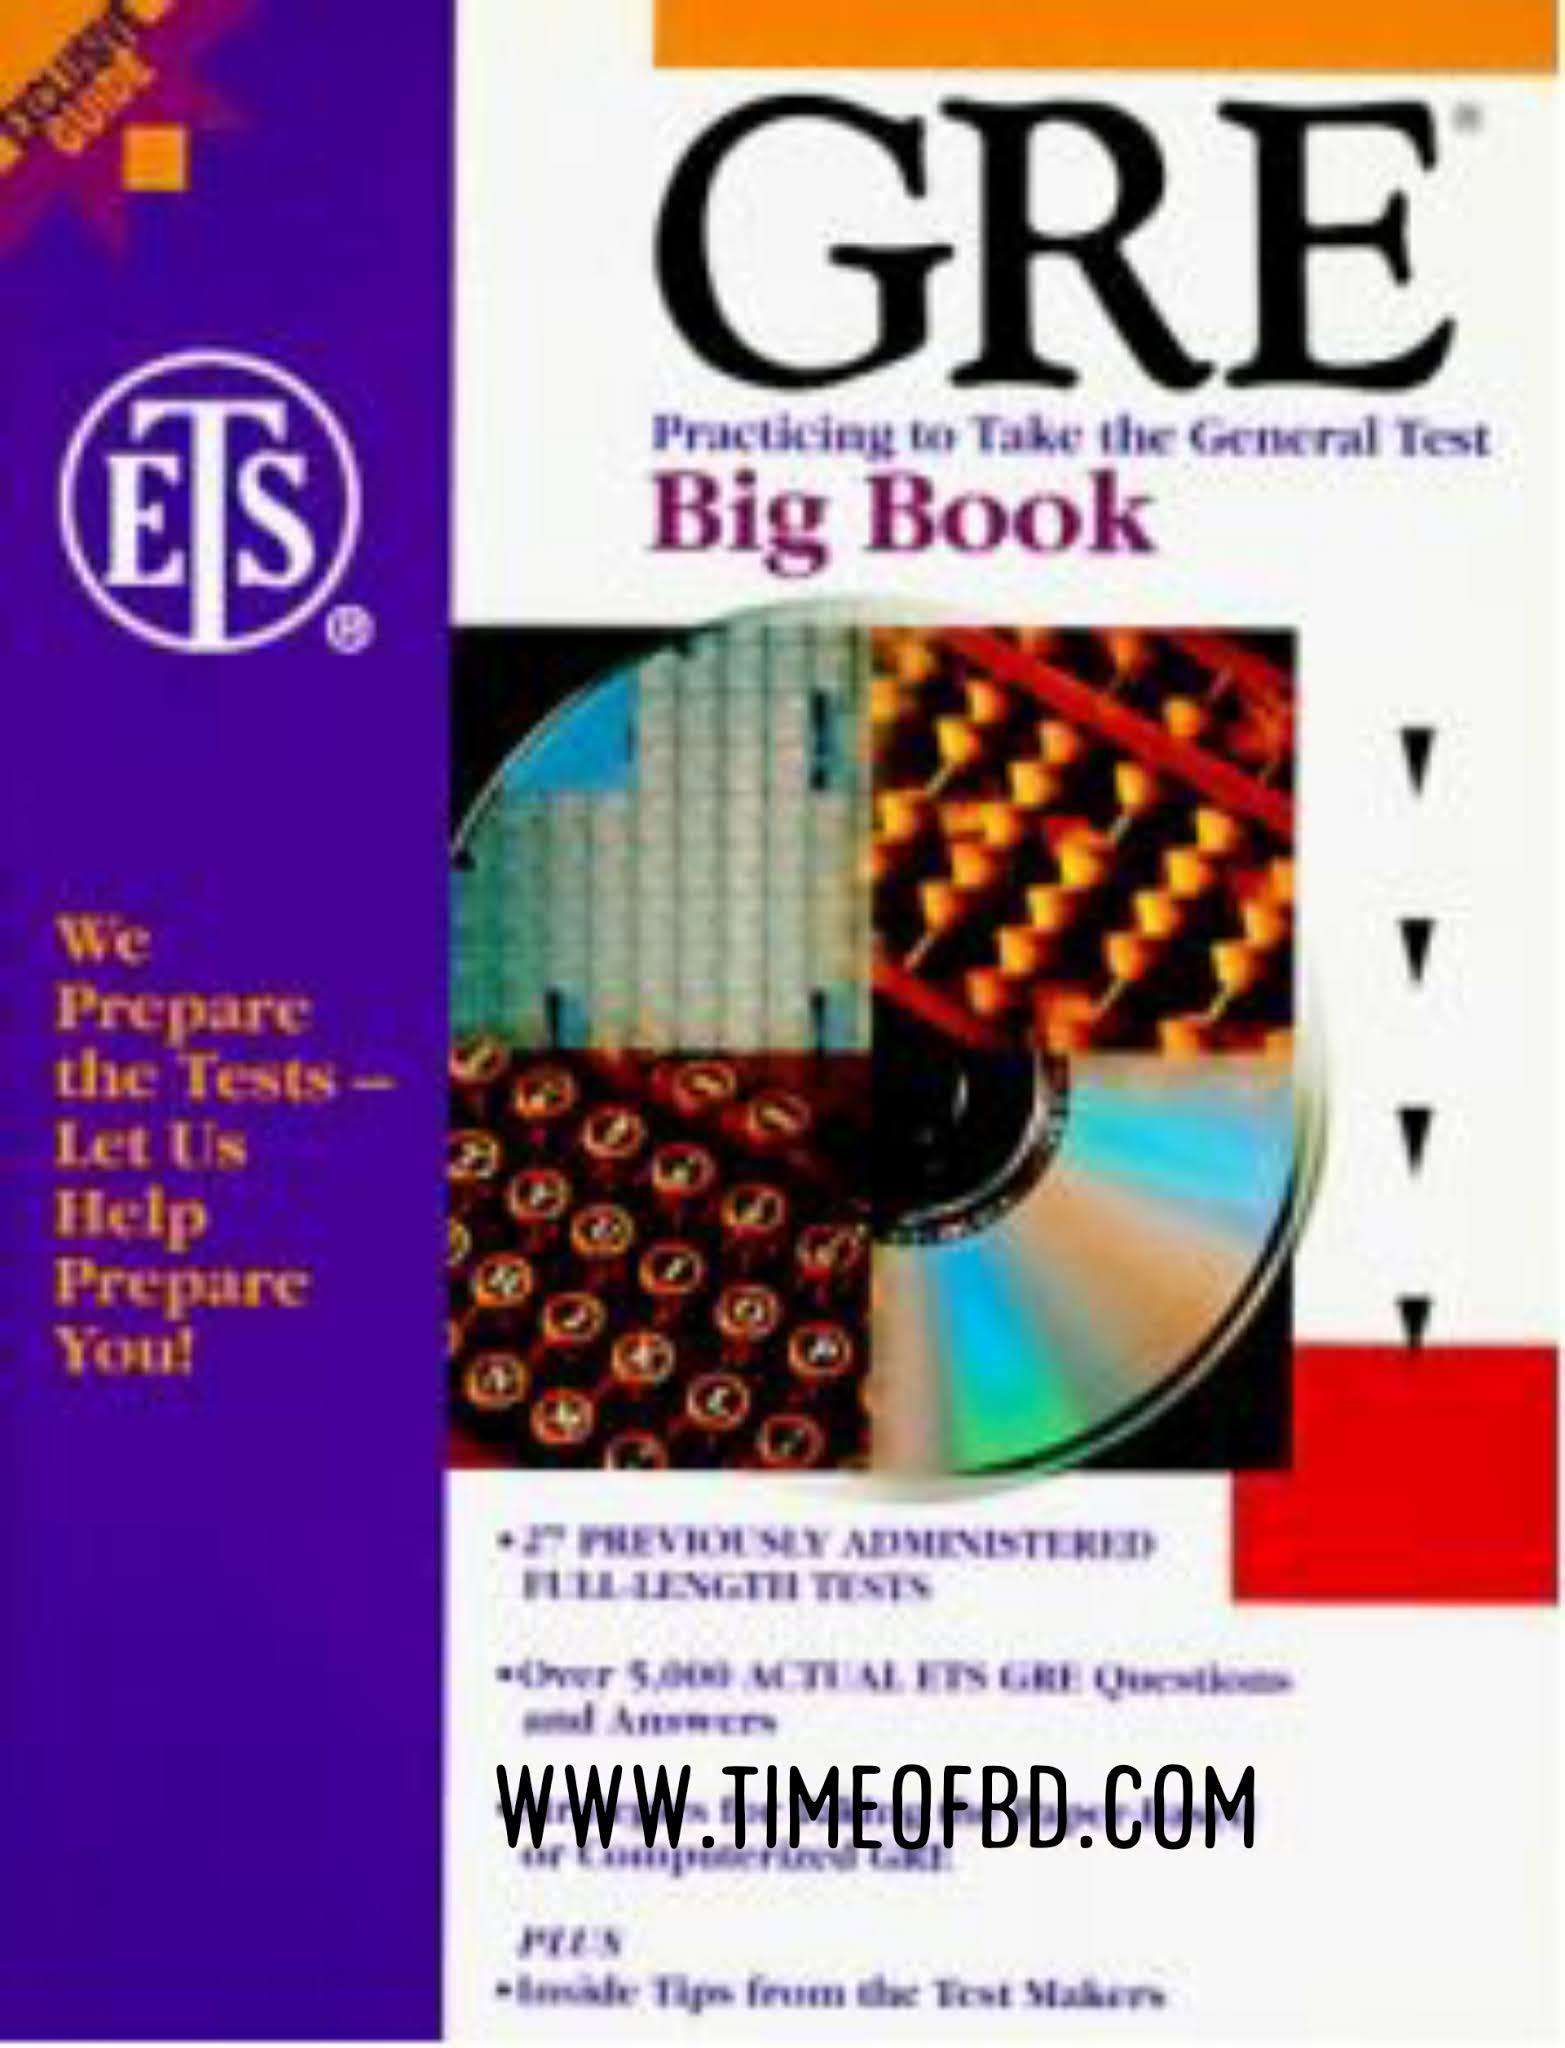 gre big book pdf file download link, gre big book pdf file download,gre big book pdf,gre big book